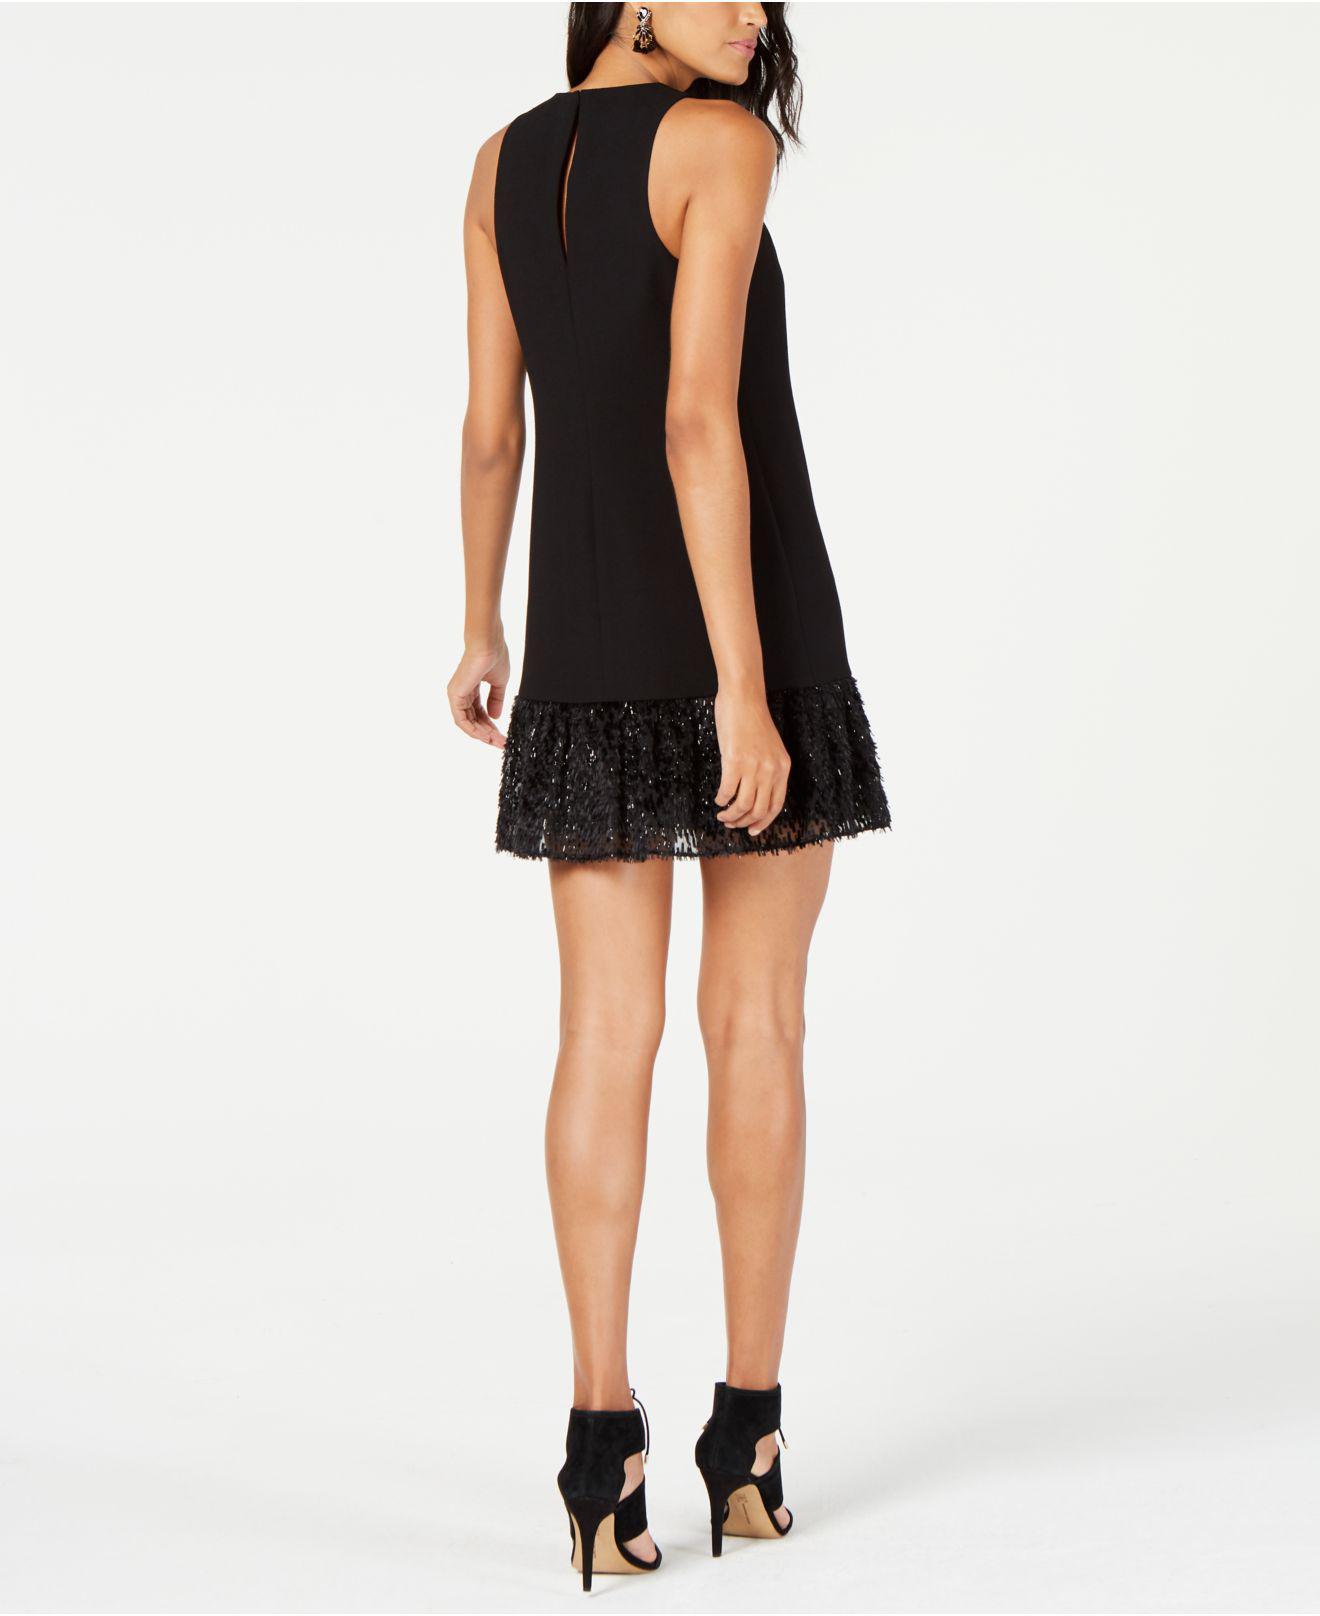 8d4a5cec34 Lyst - Trina Turk Berry Embellished-hem Shift Dress in Black